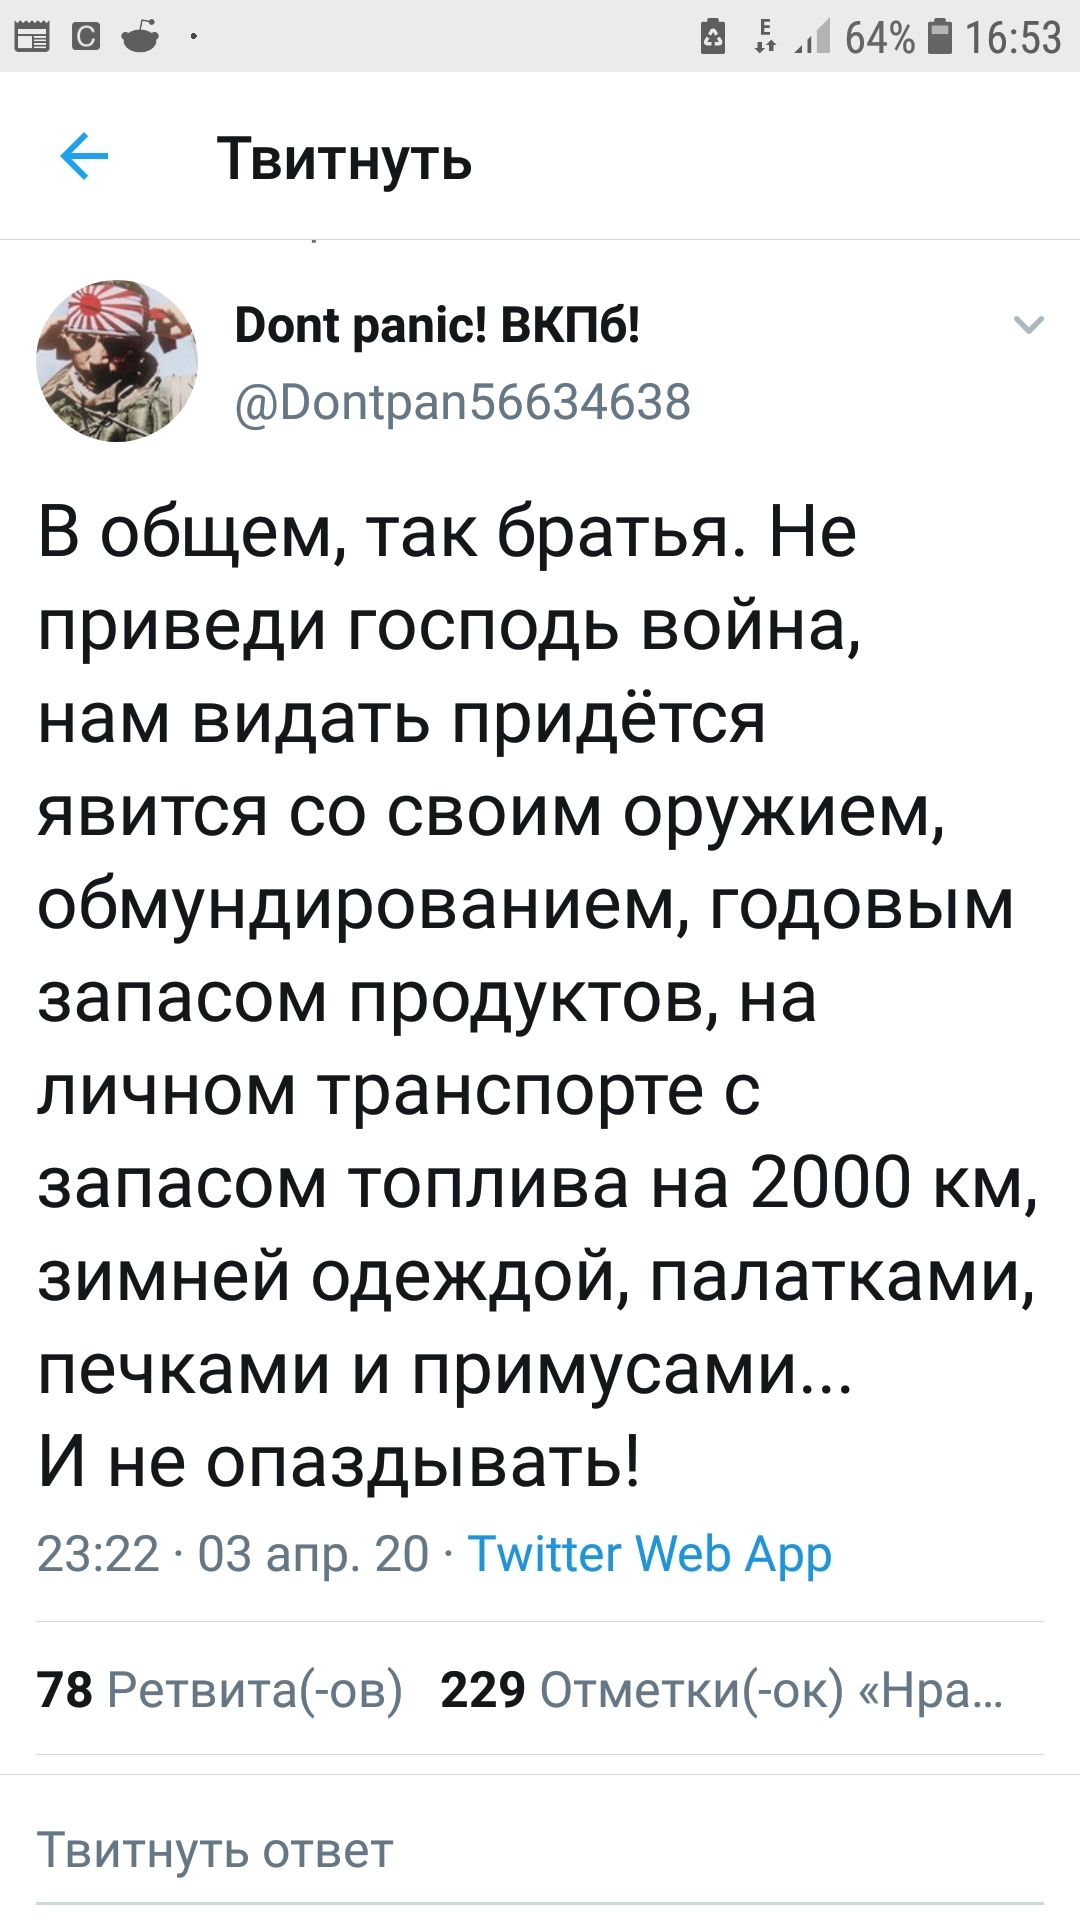 https://cs11.pikabu.ru/post_img/big/2020/04/04/8/1586008606140426291.jpg